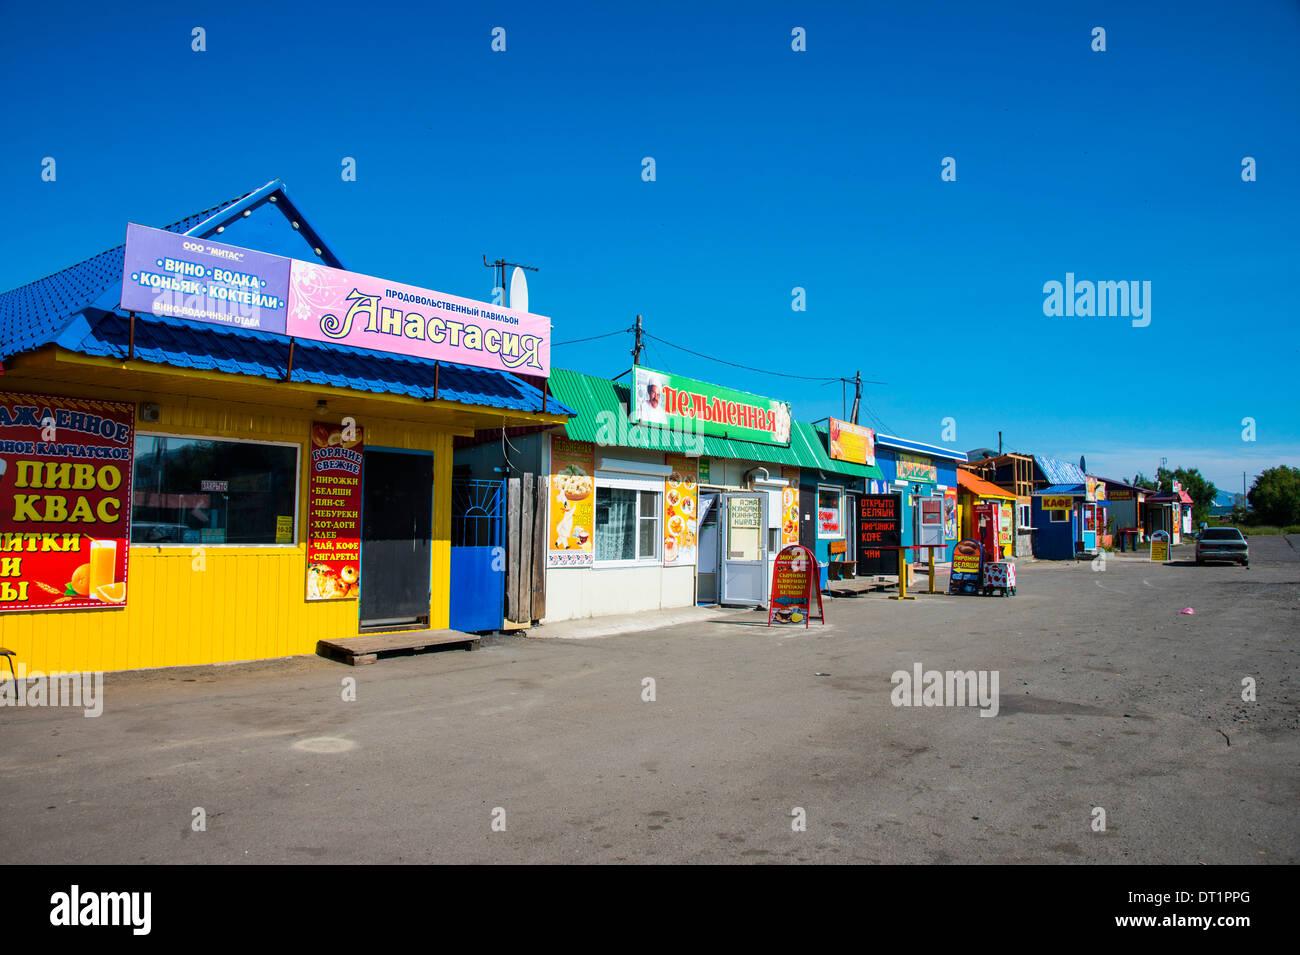 Little market shops in Petropavlovsk-Kamchatsky, Kamchatka, Russia, Eurasia - Stock Image